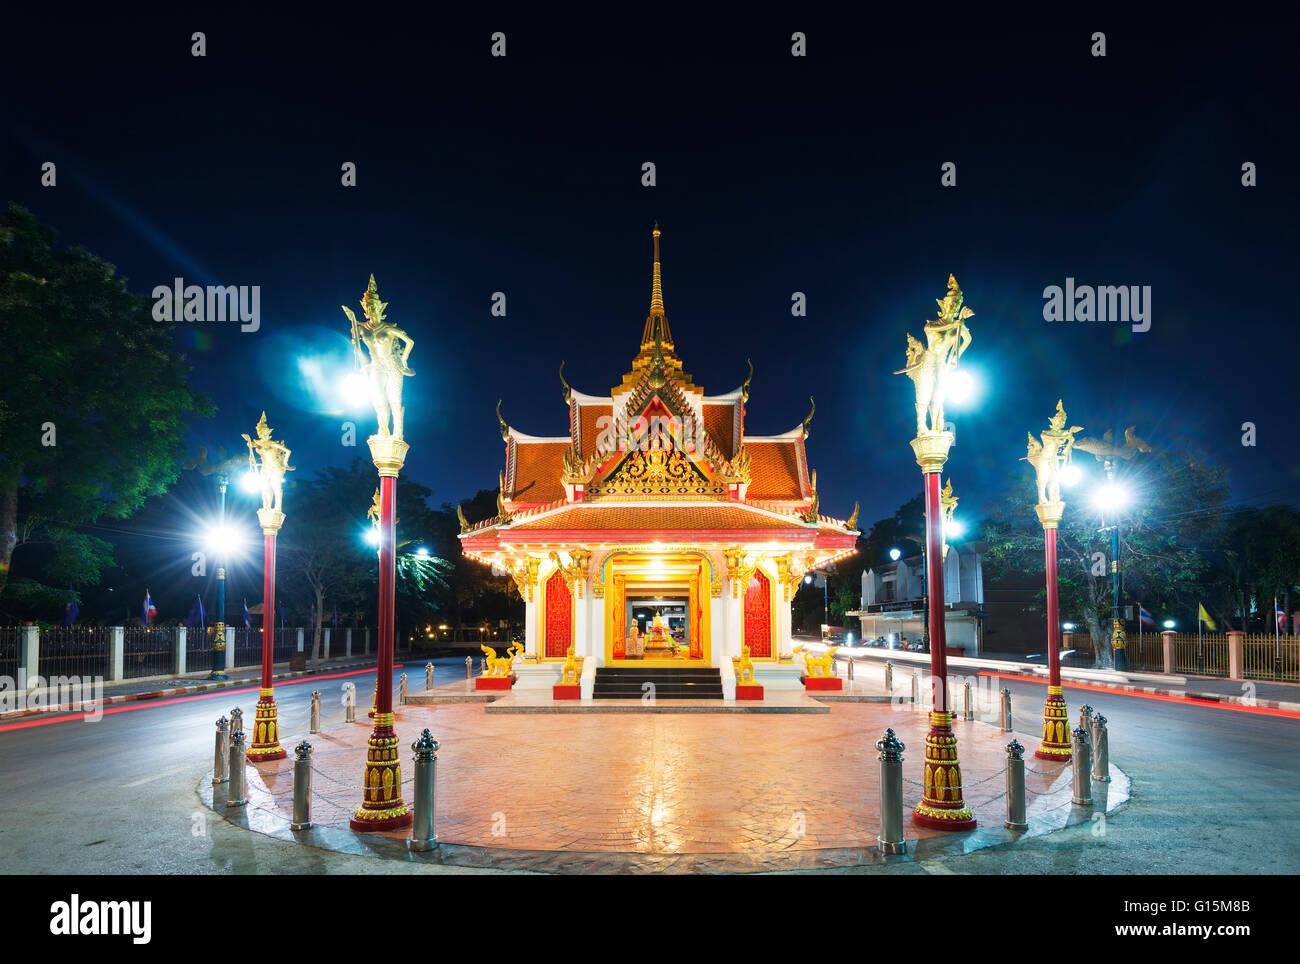 City gate, Kanchanaburi, Thailand, Southeast Asia, Asia - Stock Image